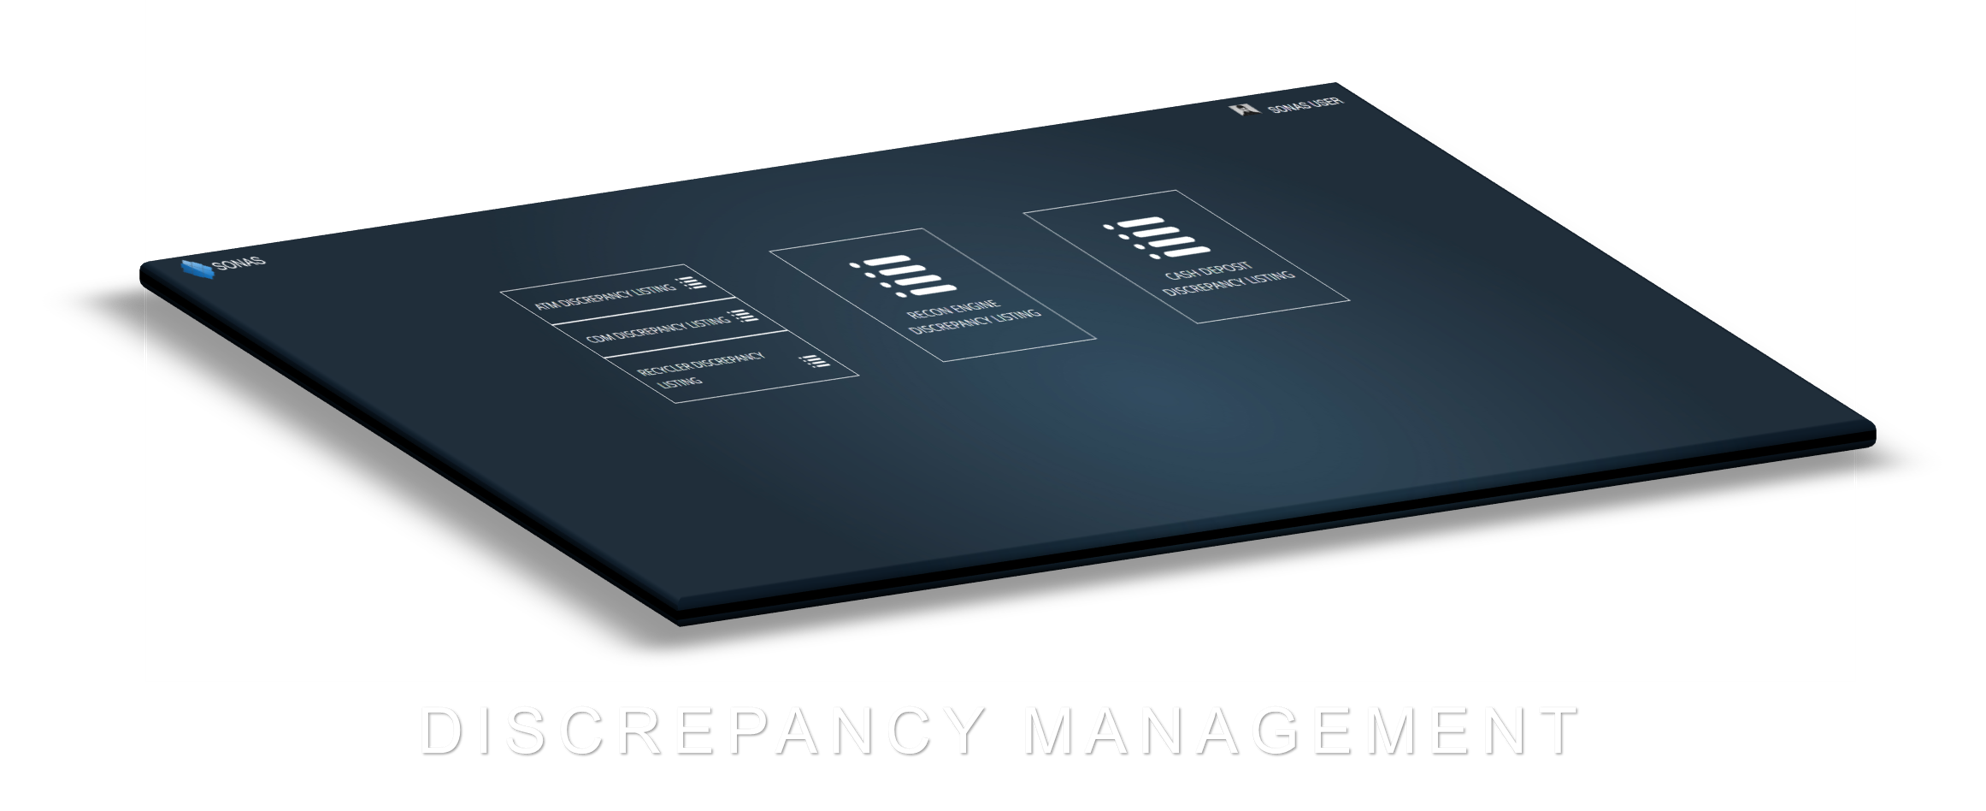 Discrepancy Management